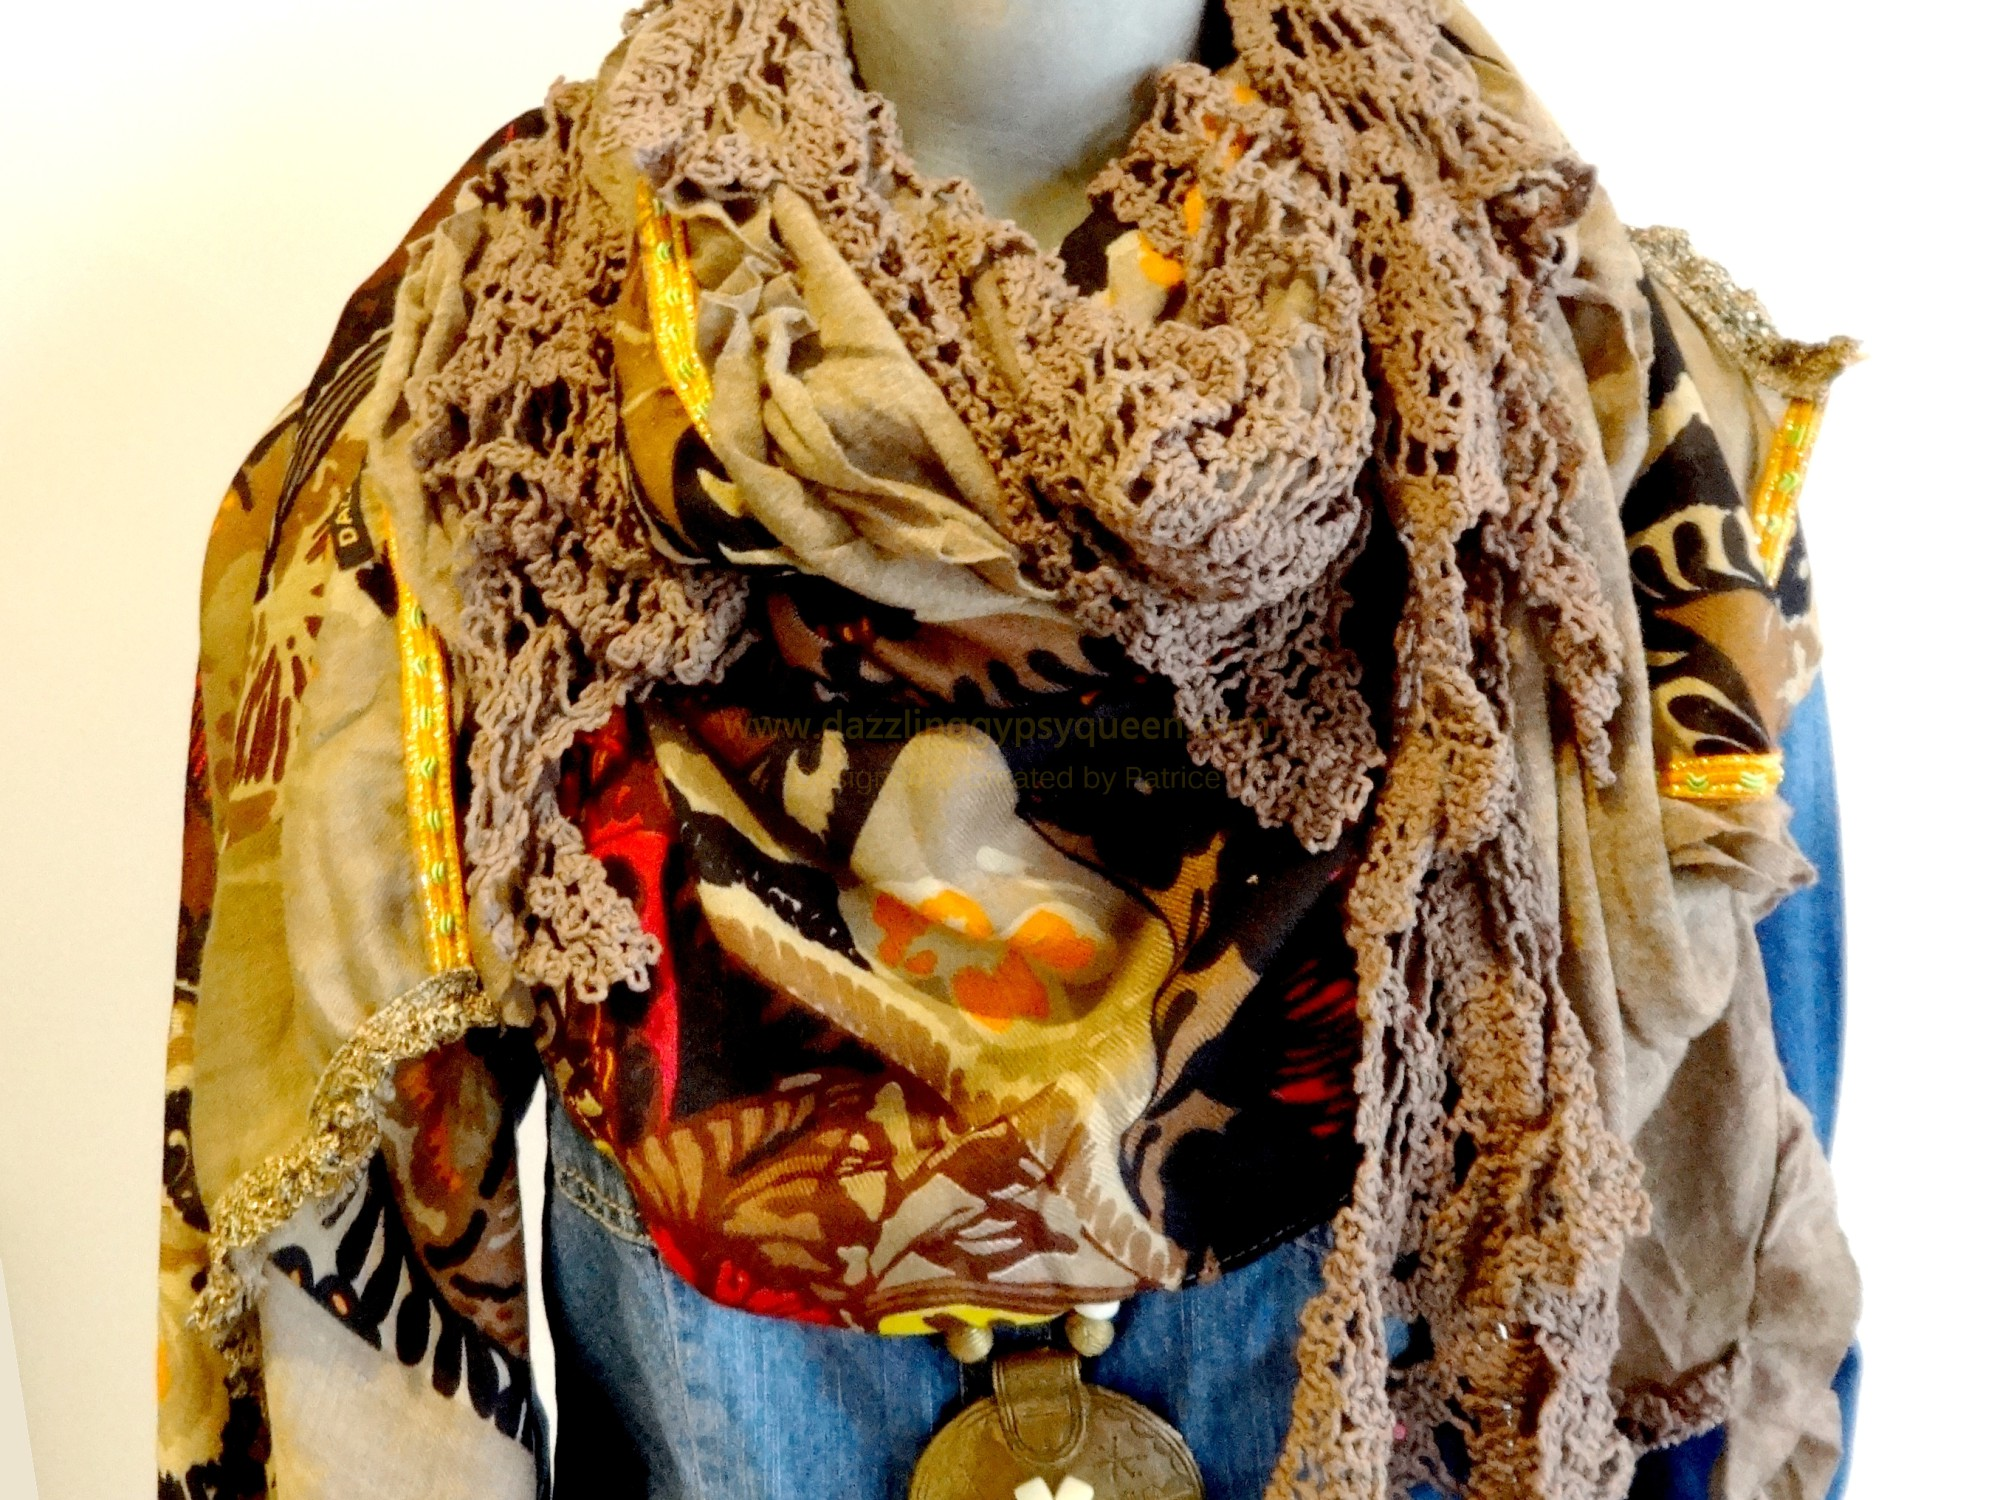 Gypsy Ibiza Sjaal groot Oranje - by Dazzling Gypsy Queen